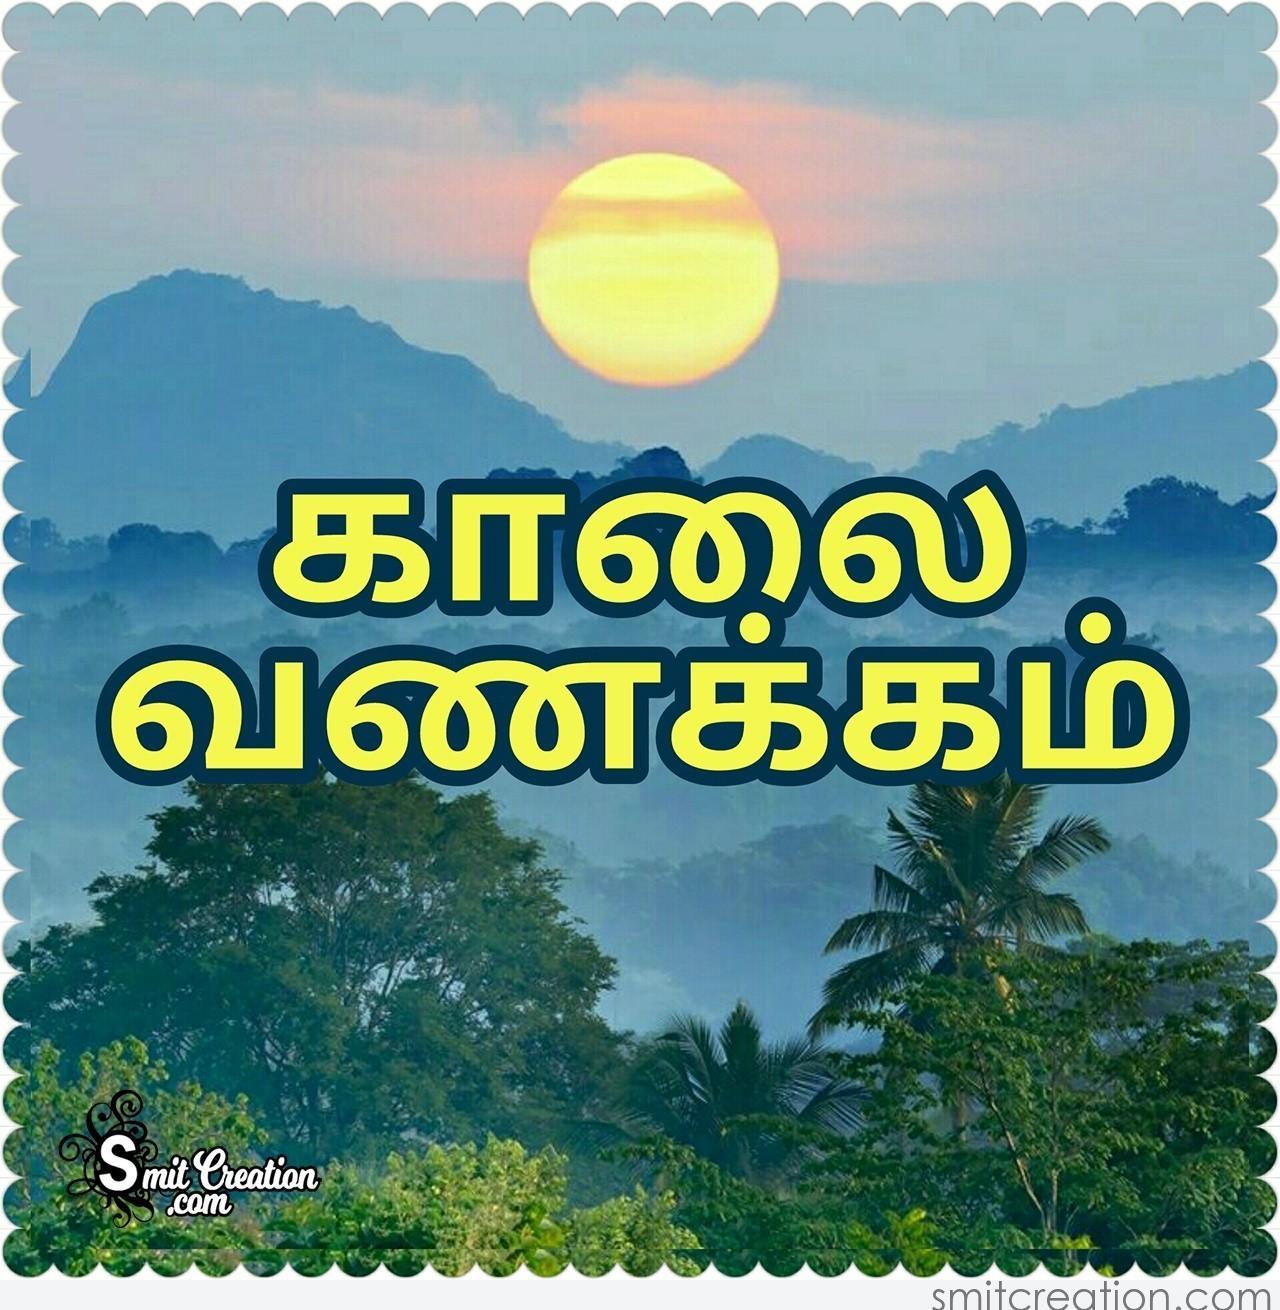 Kalai Vanakkam Tamil Pictures And Graphics Smitcreationcom Page 2